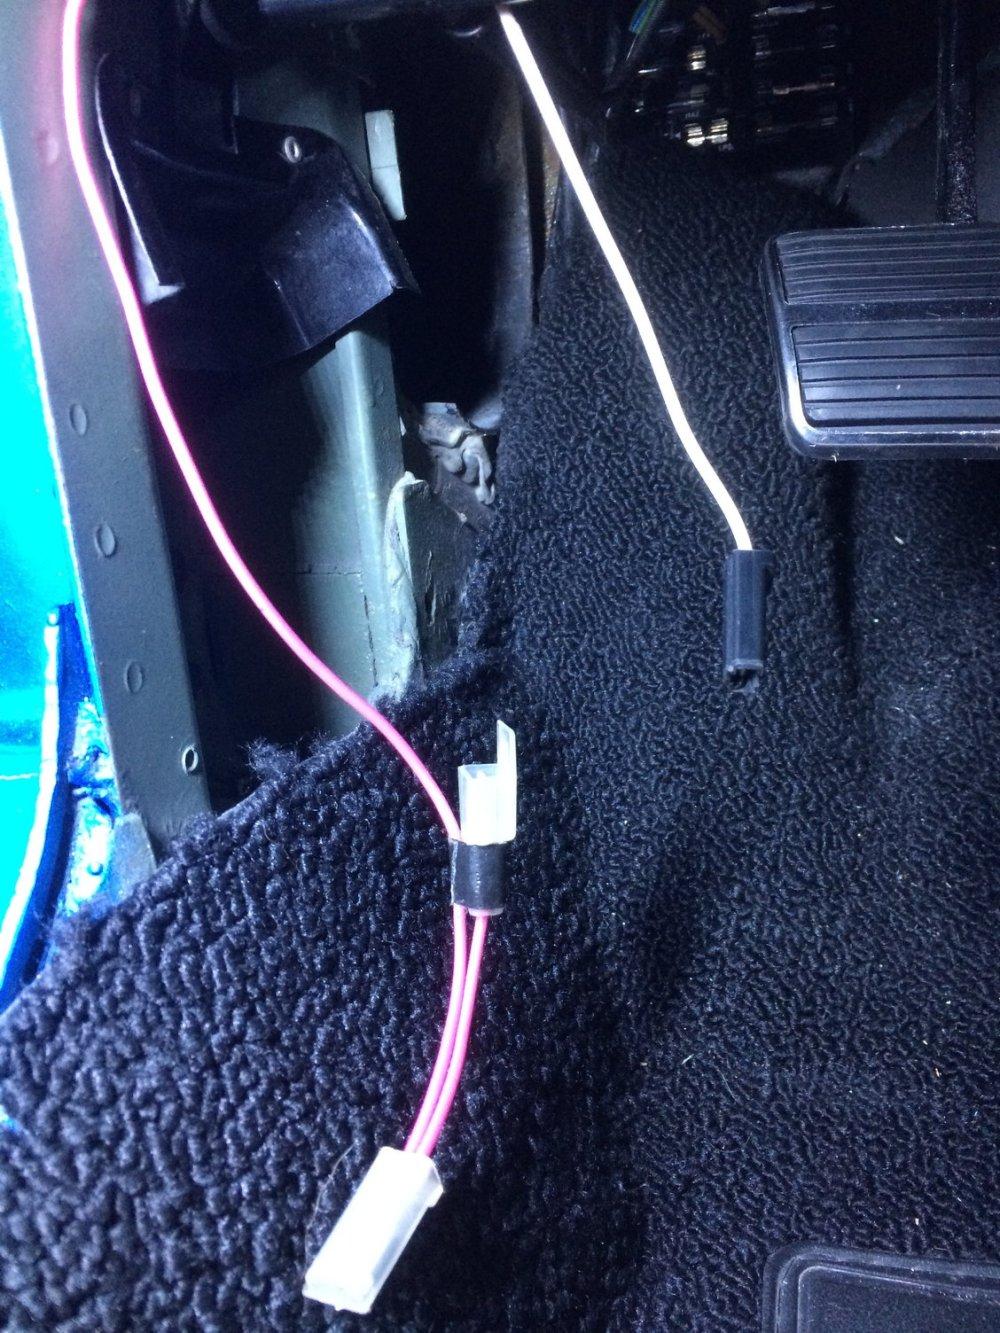 medium resolution of 68 corvette wiring harness question corvetteforum chevrolet 68 corvette wiring harness